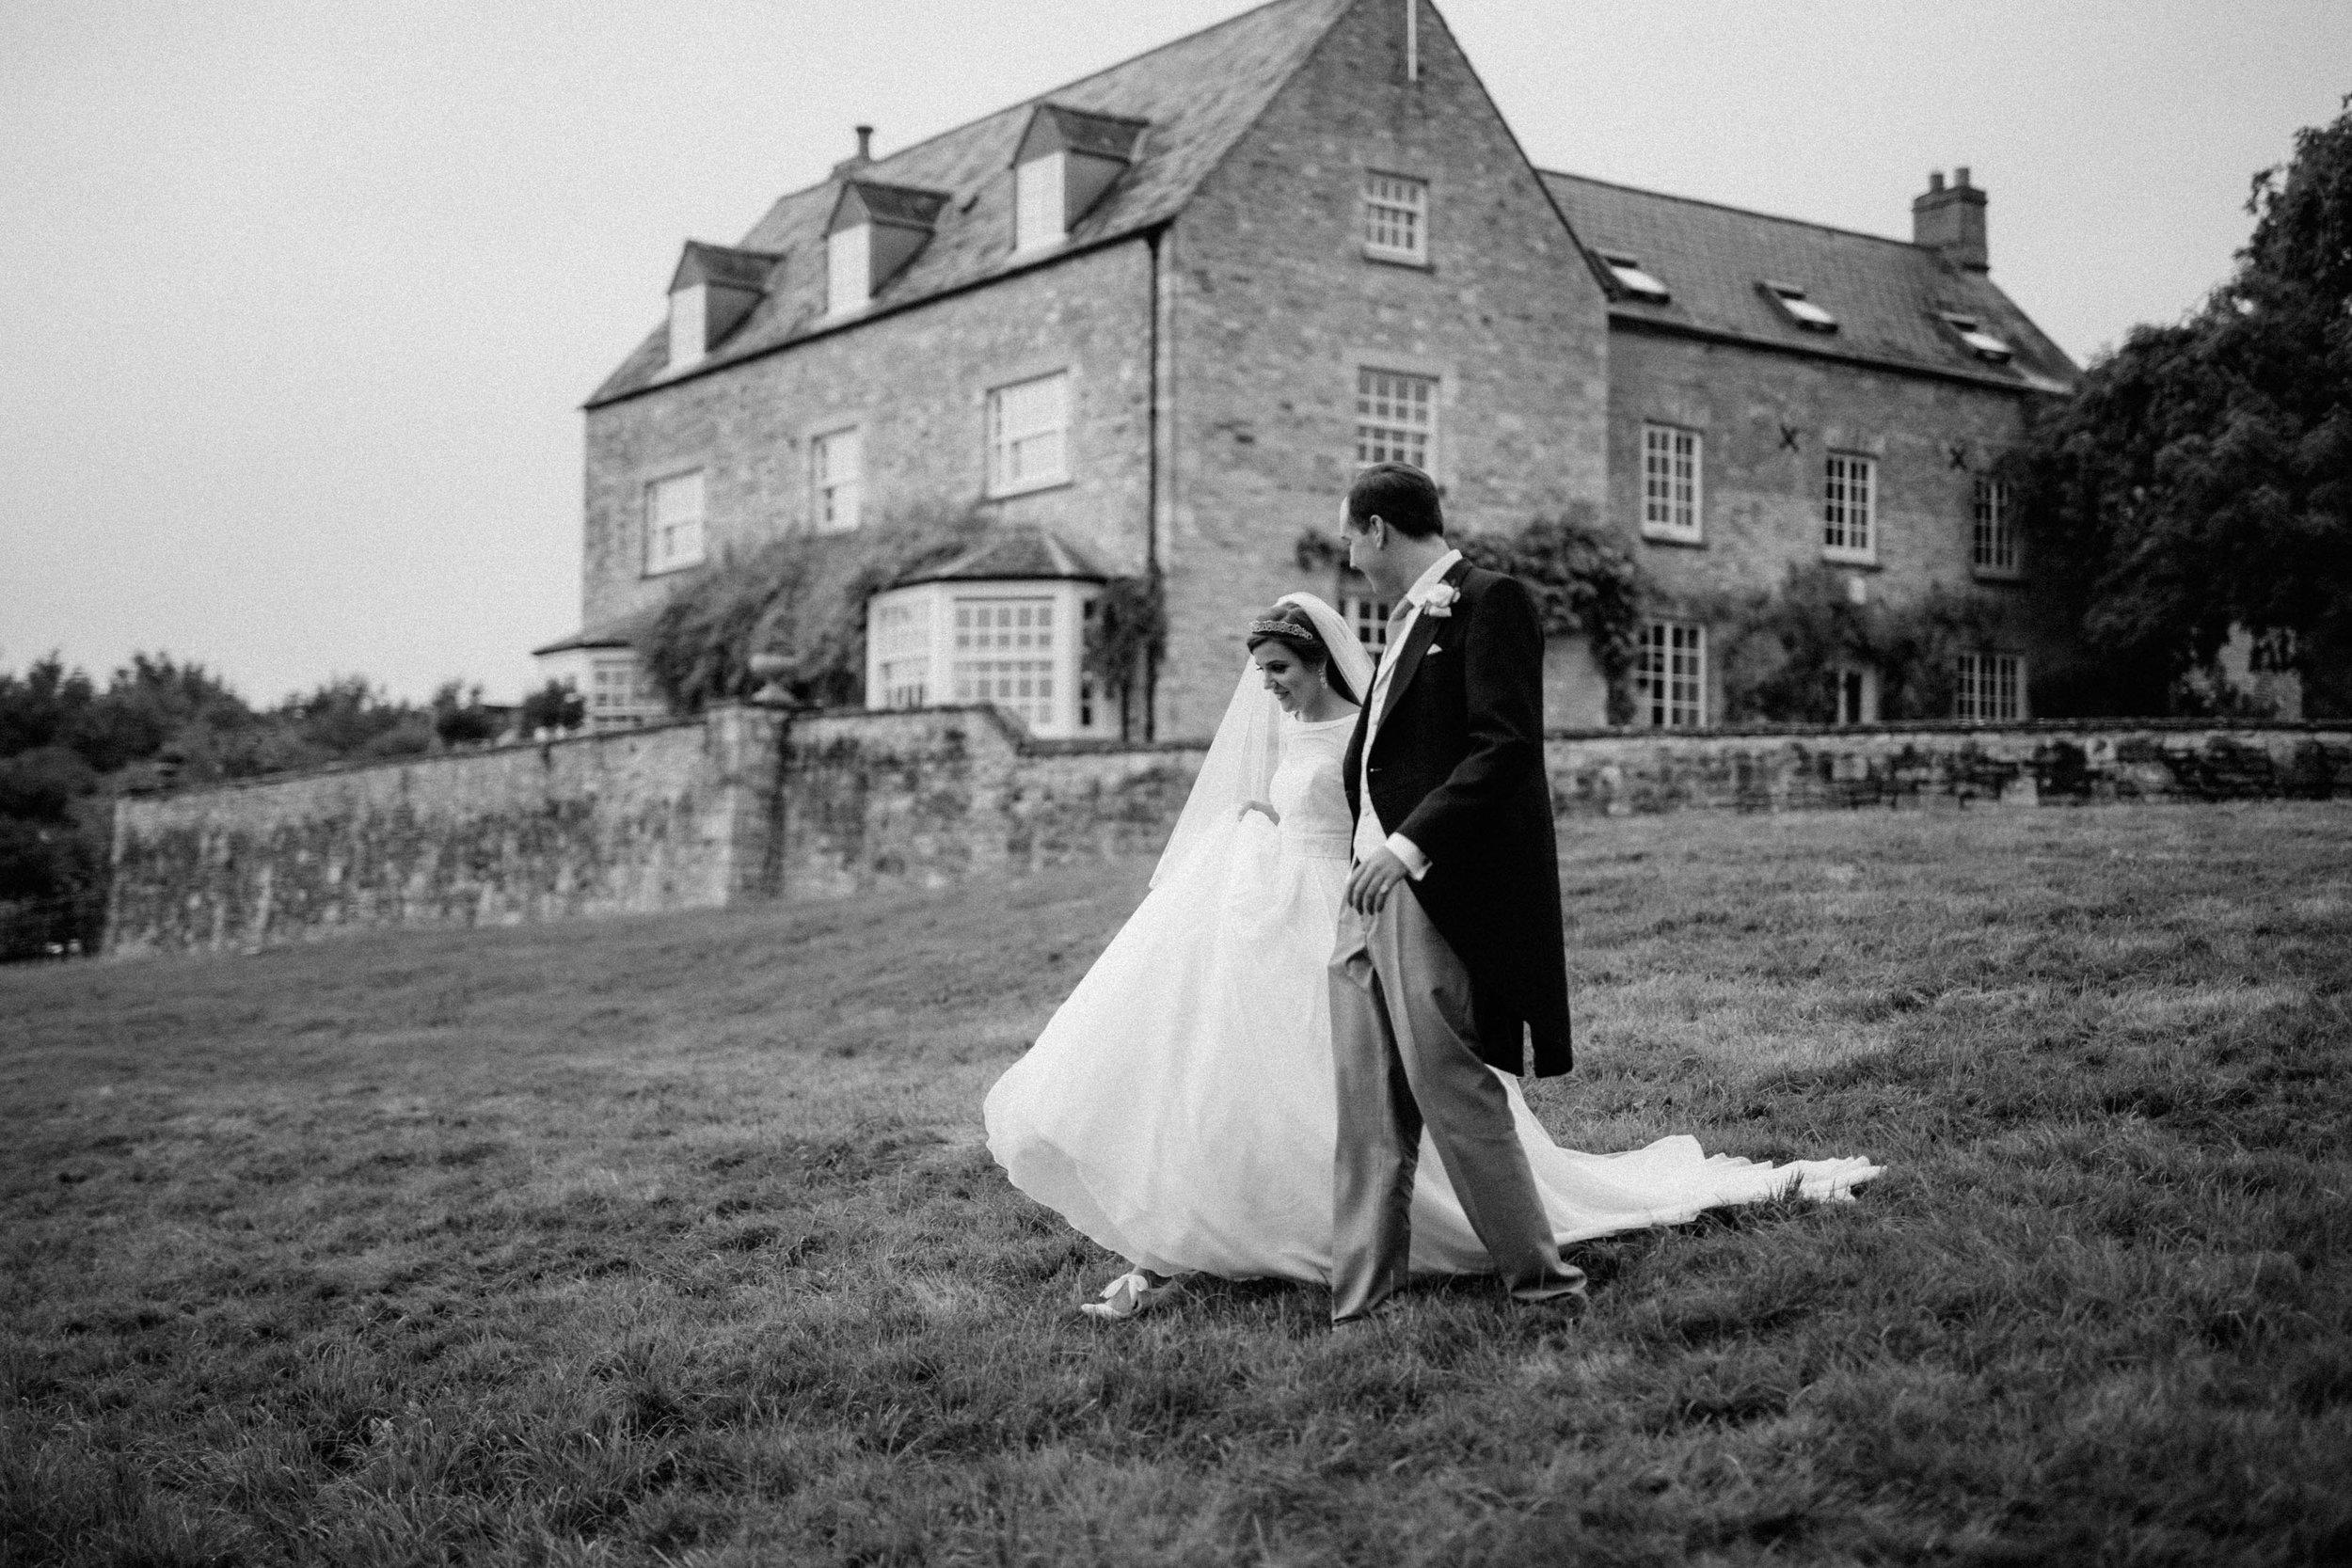 oxford_wedding_photographer-99.jpg